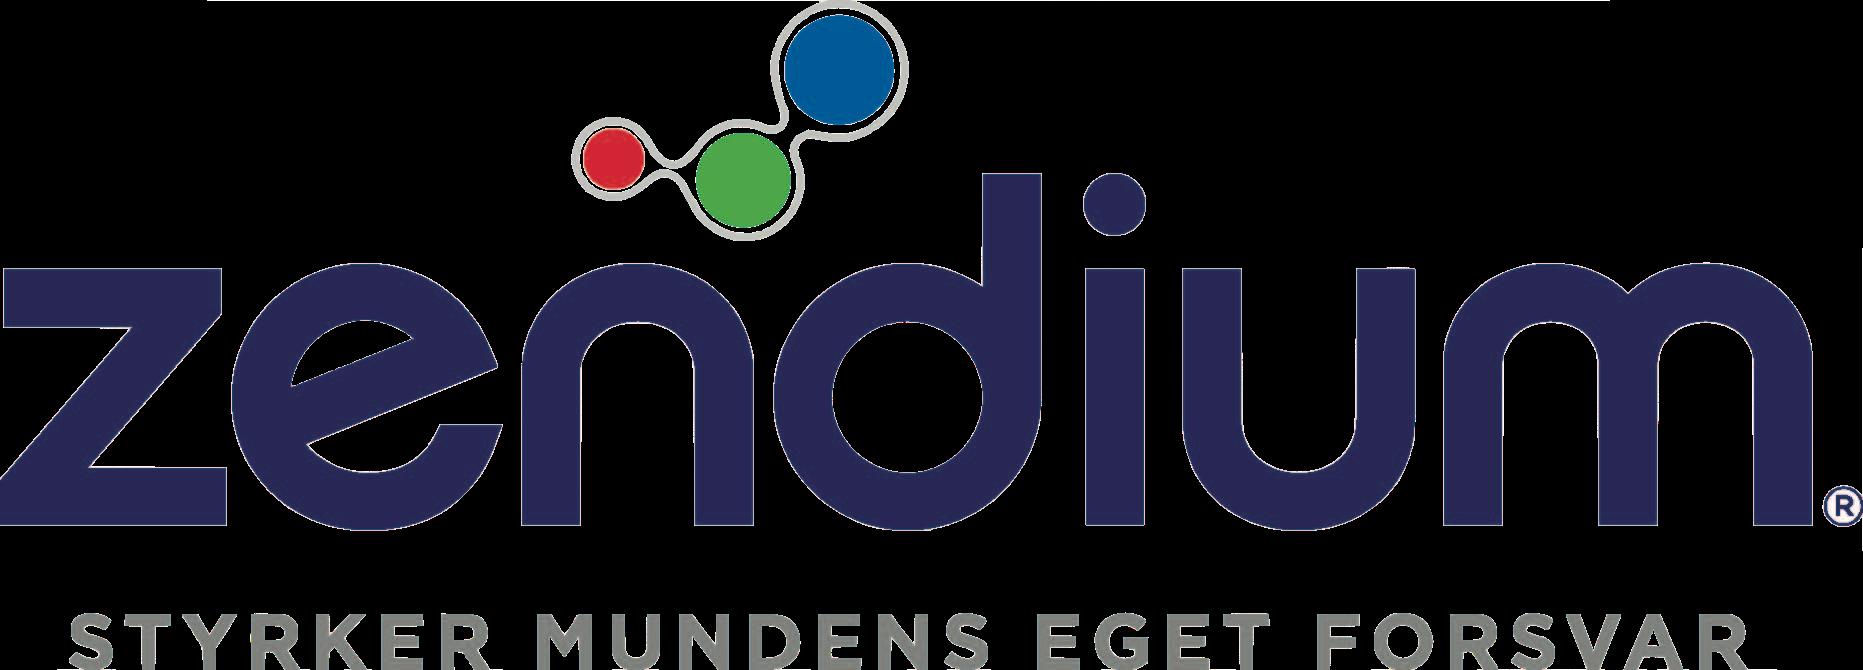 zendium_logo.png